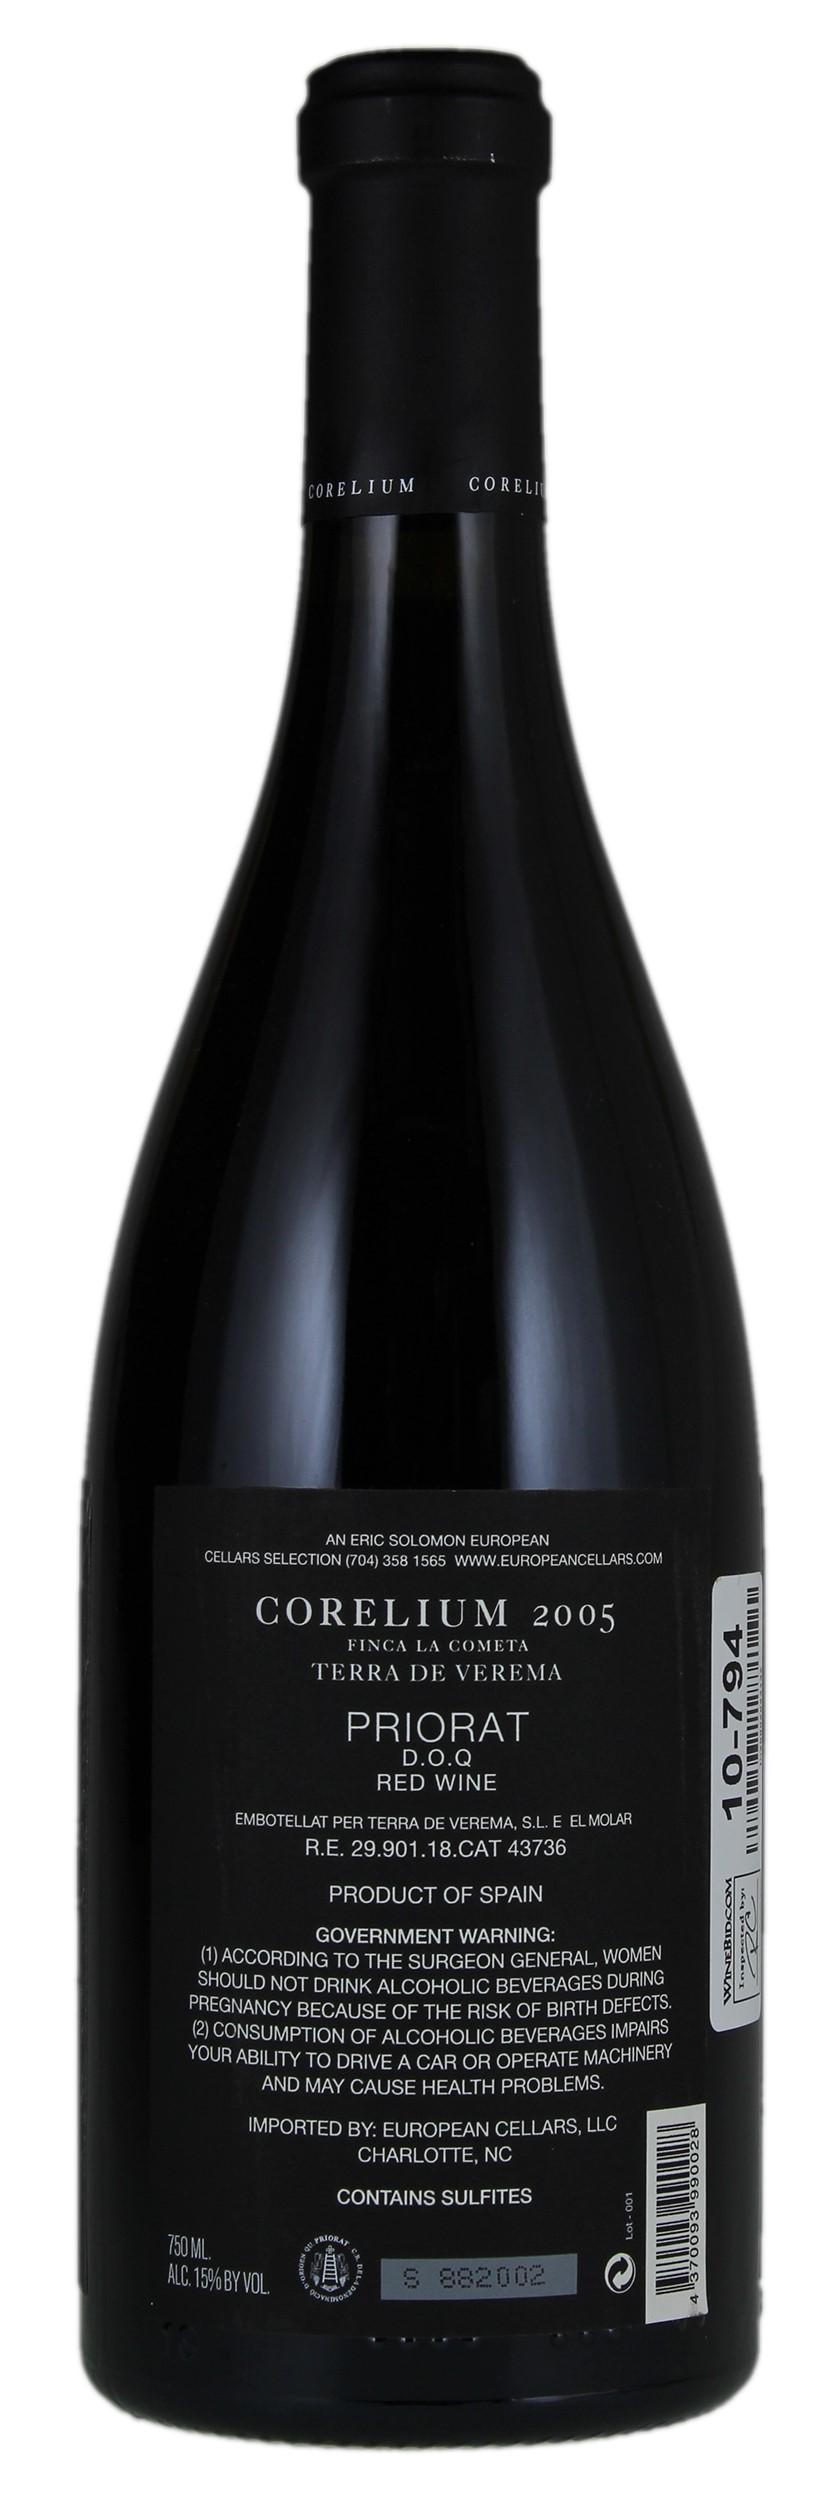 /BuyWine/Item/Auction/1020259/2005-Terra-de-Verema-Corelium-Finca-La-Cometa-6-bo~  sc 1 st  WineBid & Terra de Verema Corelium Finca La Cometa 2005 Red Wine from Spain ...